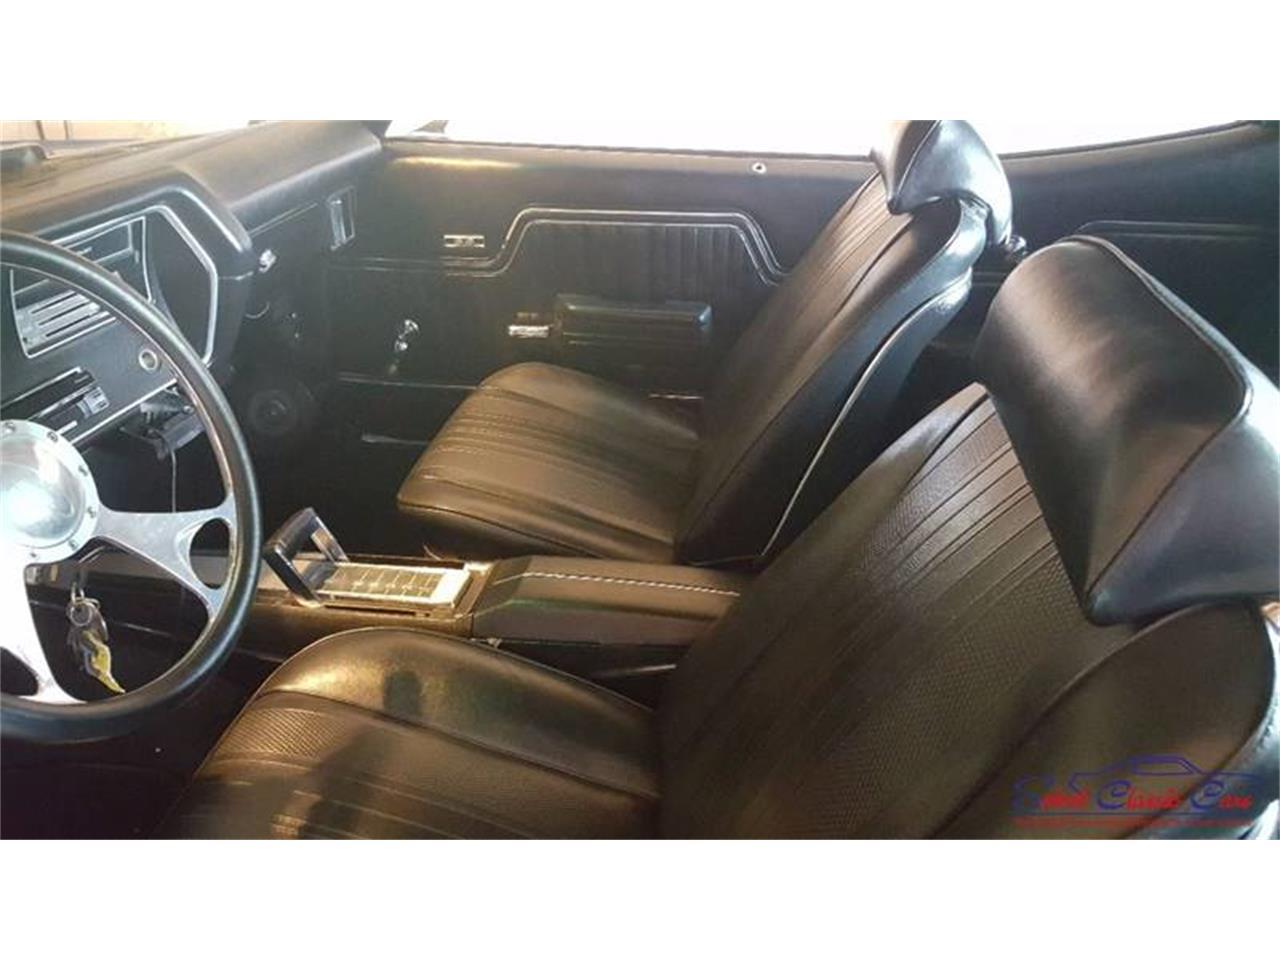 Large Picture of 1970 Chevrolet Chevelle located in Hiram Georgia - LDXM